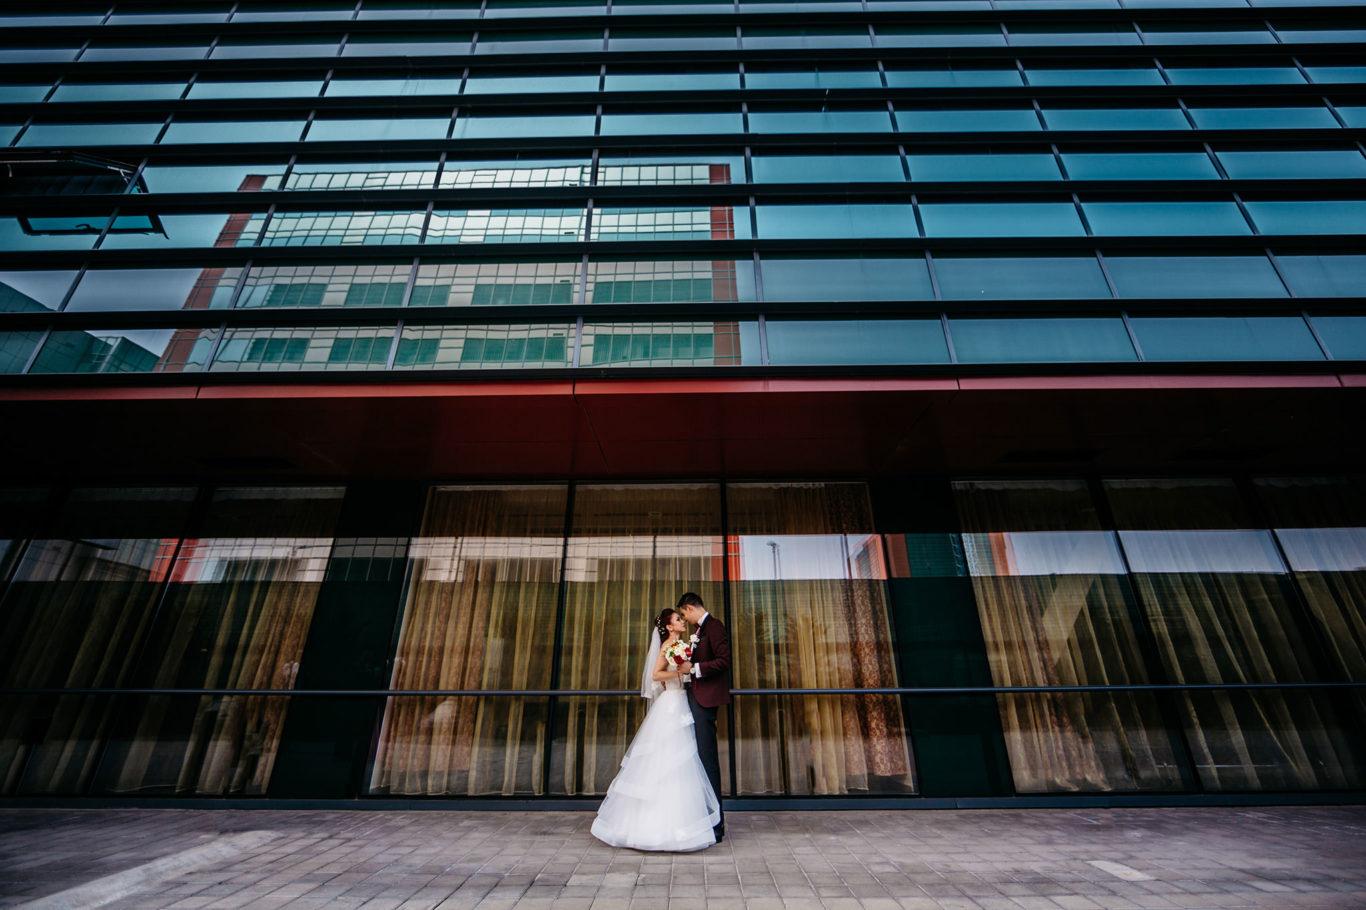 0153-fotografie-nunta-bucuresti-cristina-nicusor-fotograf-ciprian-dumitrescu-dc1_0013